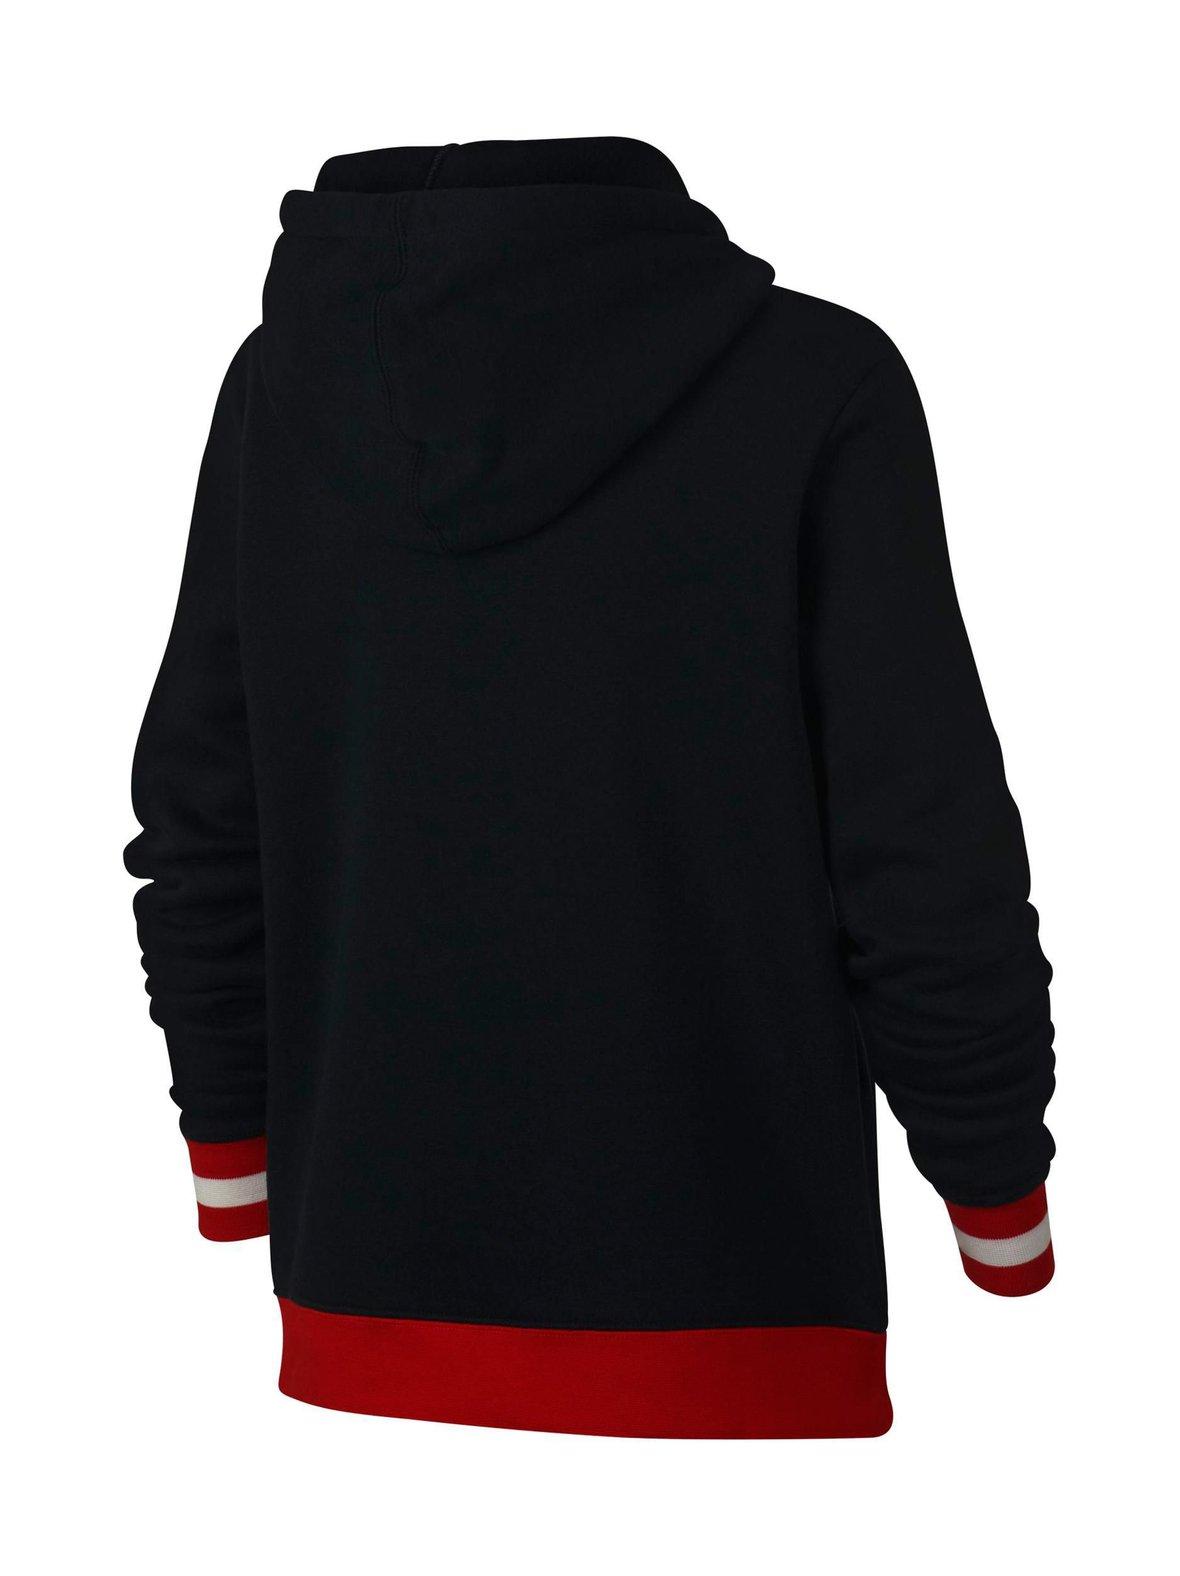 quality design 5e55f 5d7d9 Black University Red Nike Air-huppari   XL   Lapset   Stockmann.com